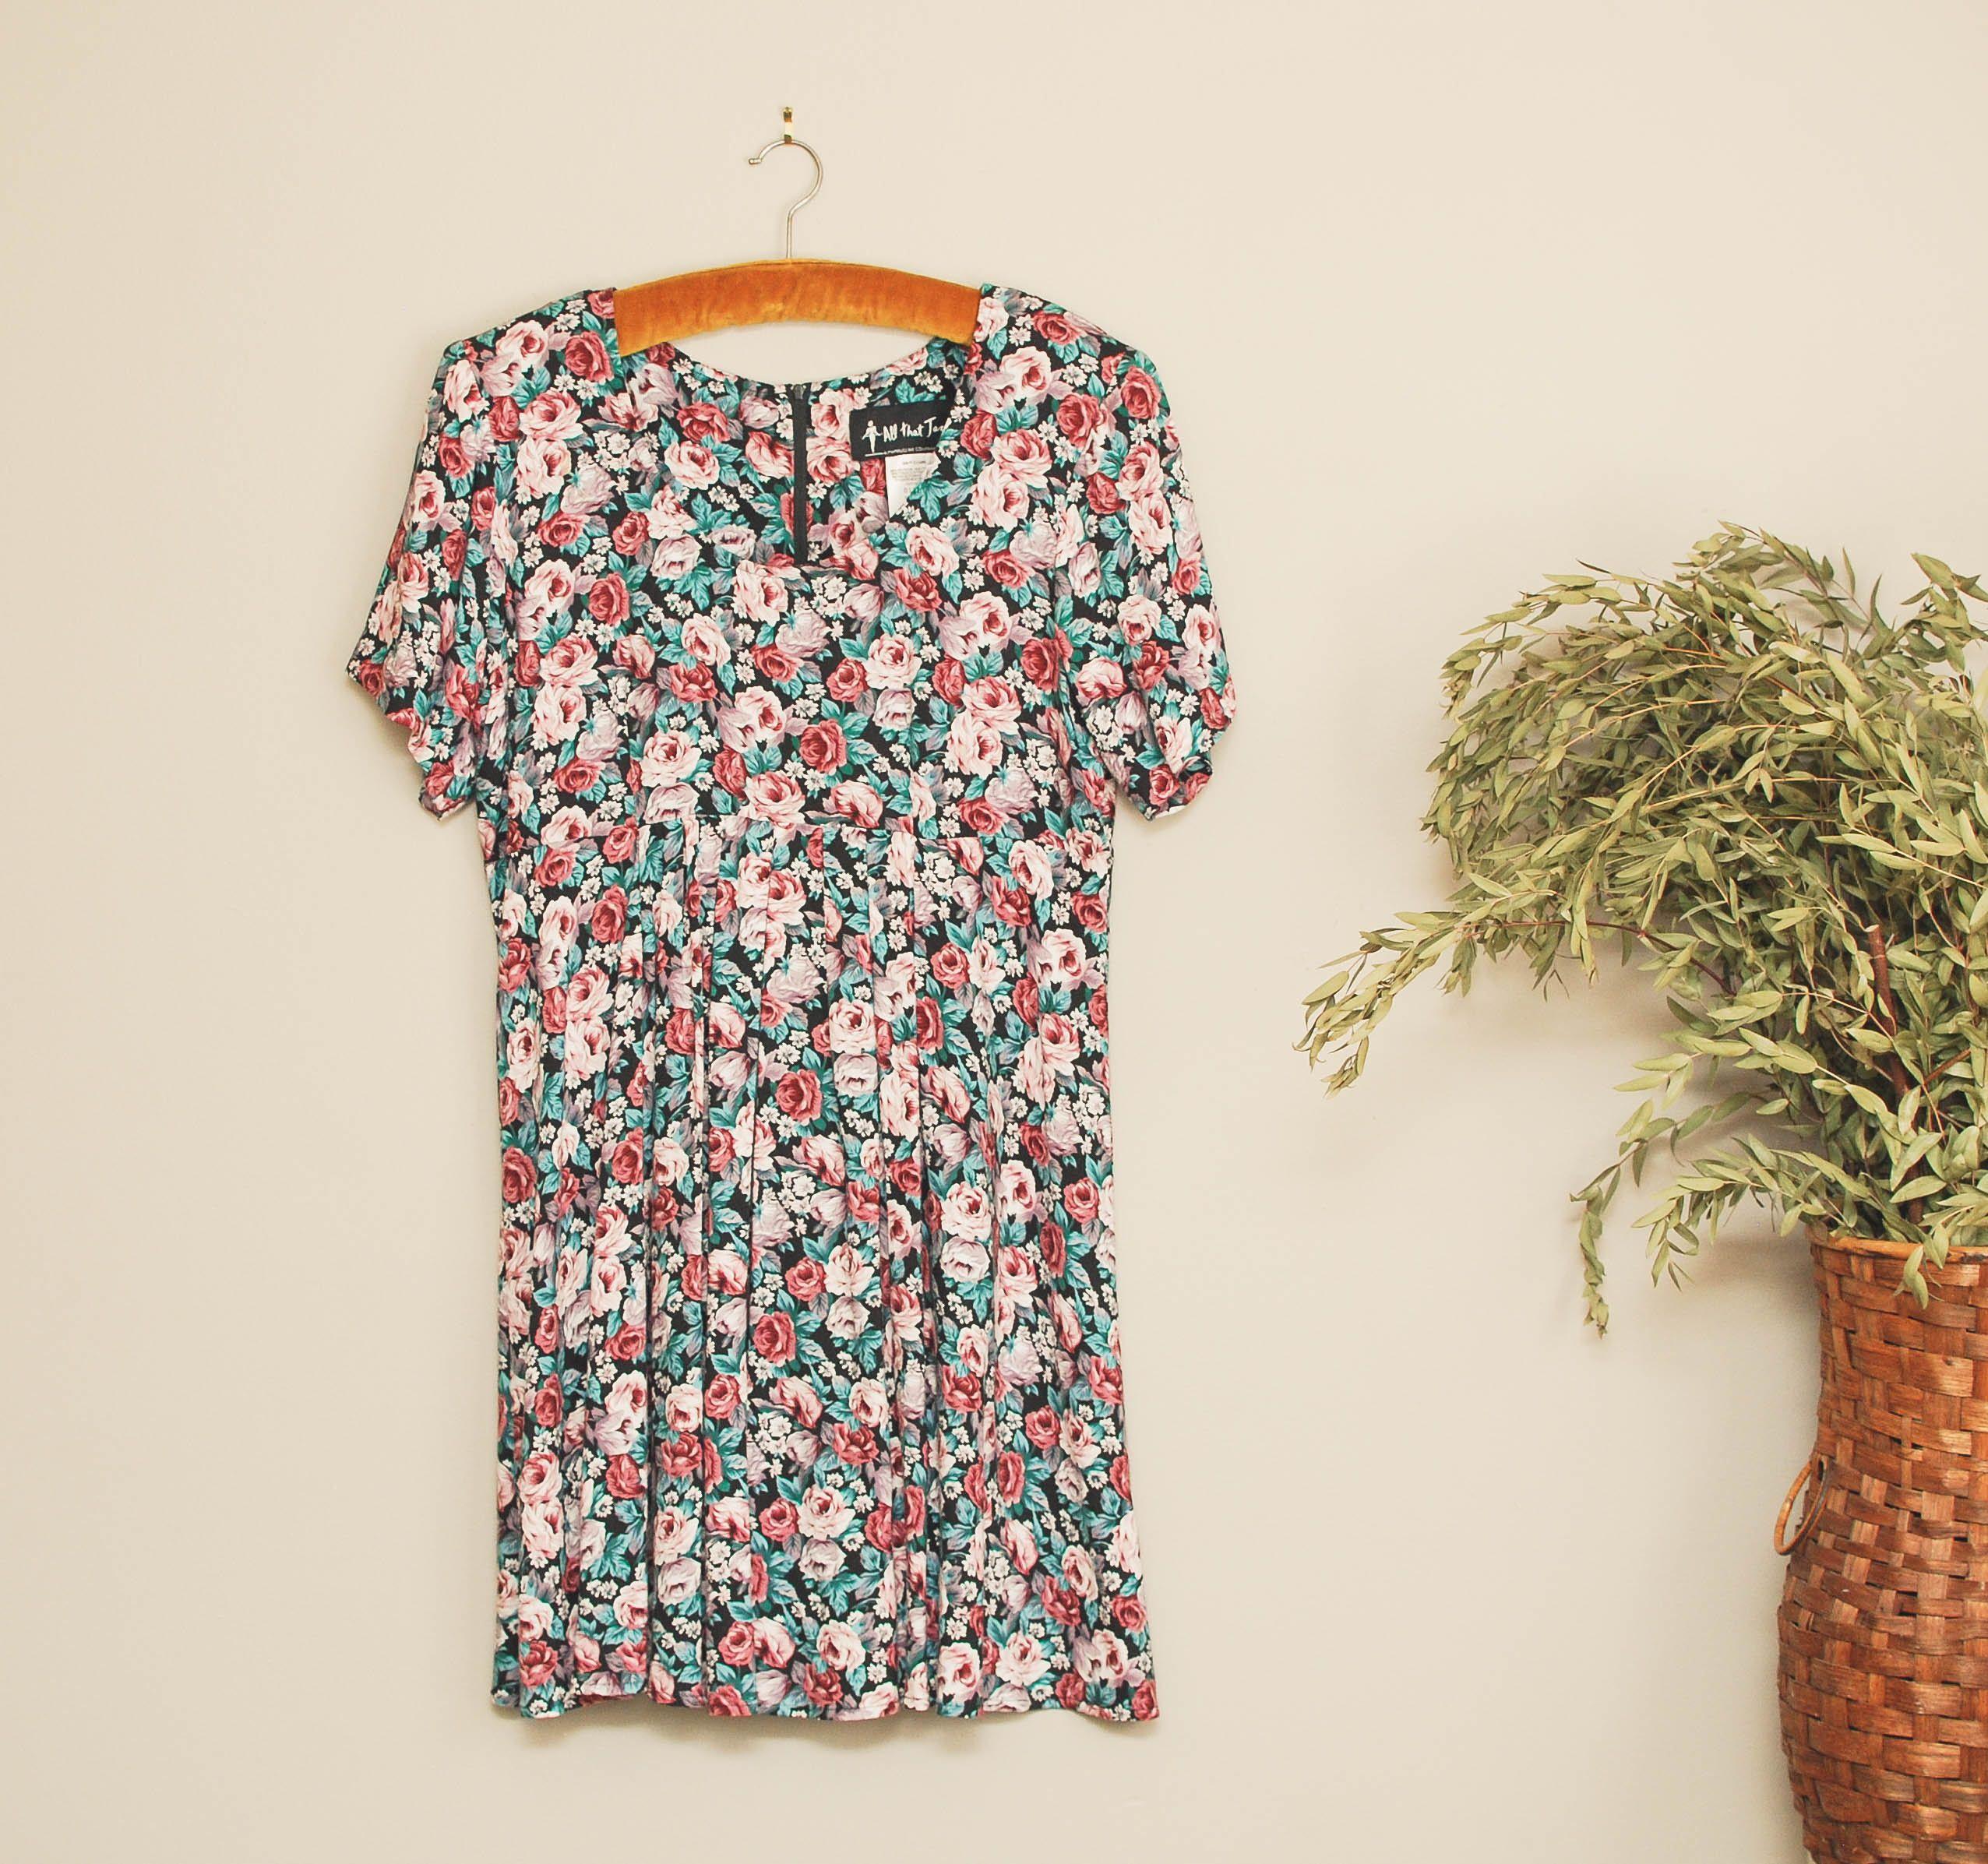 Vintage 90s All That Jazz Babydoll Dress Fl Rose Print Mini Frenchie